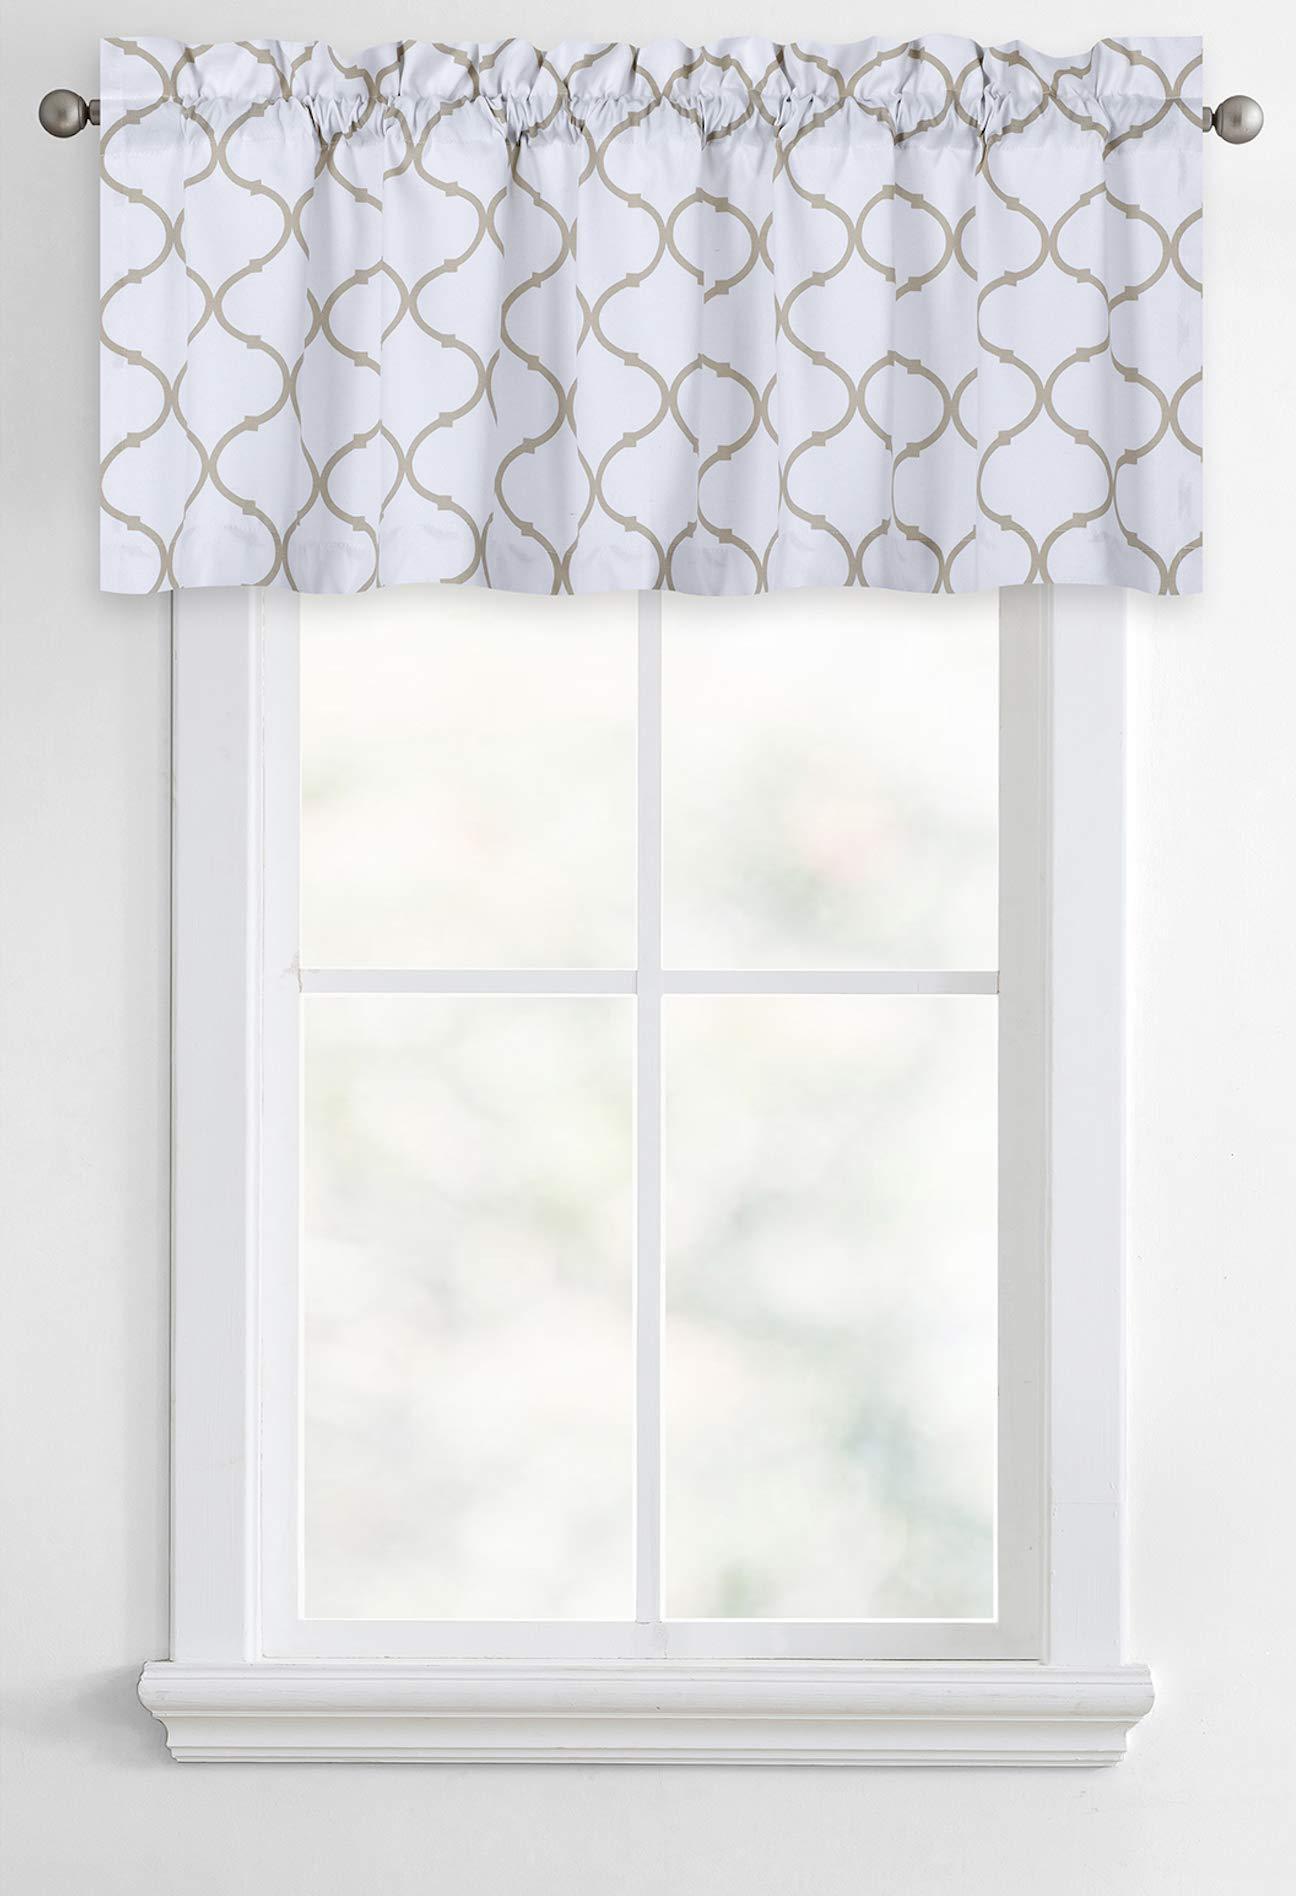 Regal Home Collections Shabby Quatrefoil Oversized Lattice Window Valance - Assorted Colors (Hunter Linen)